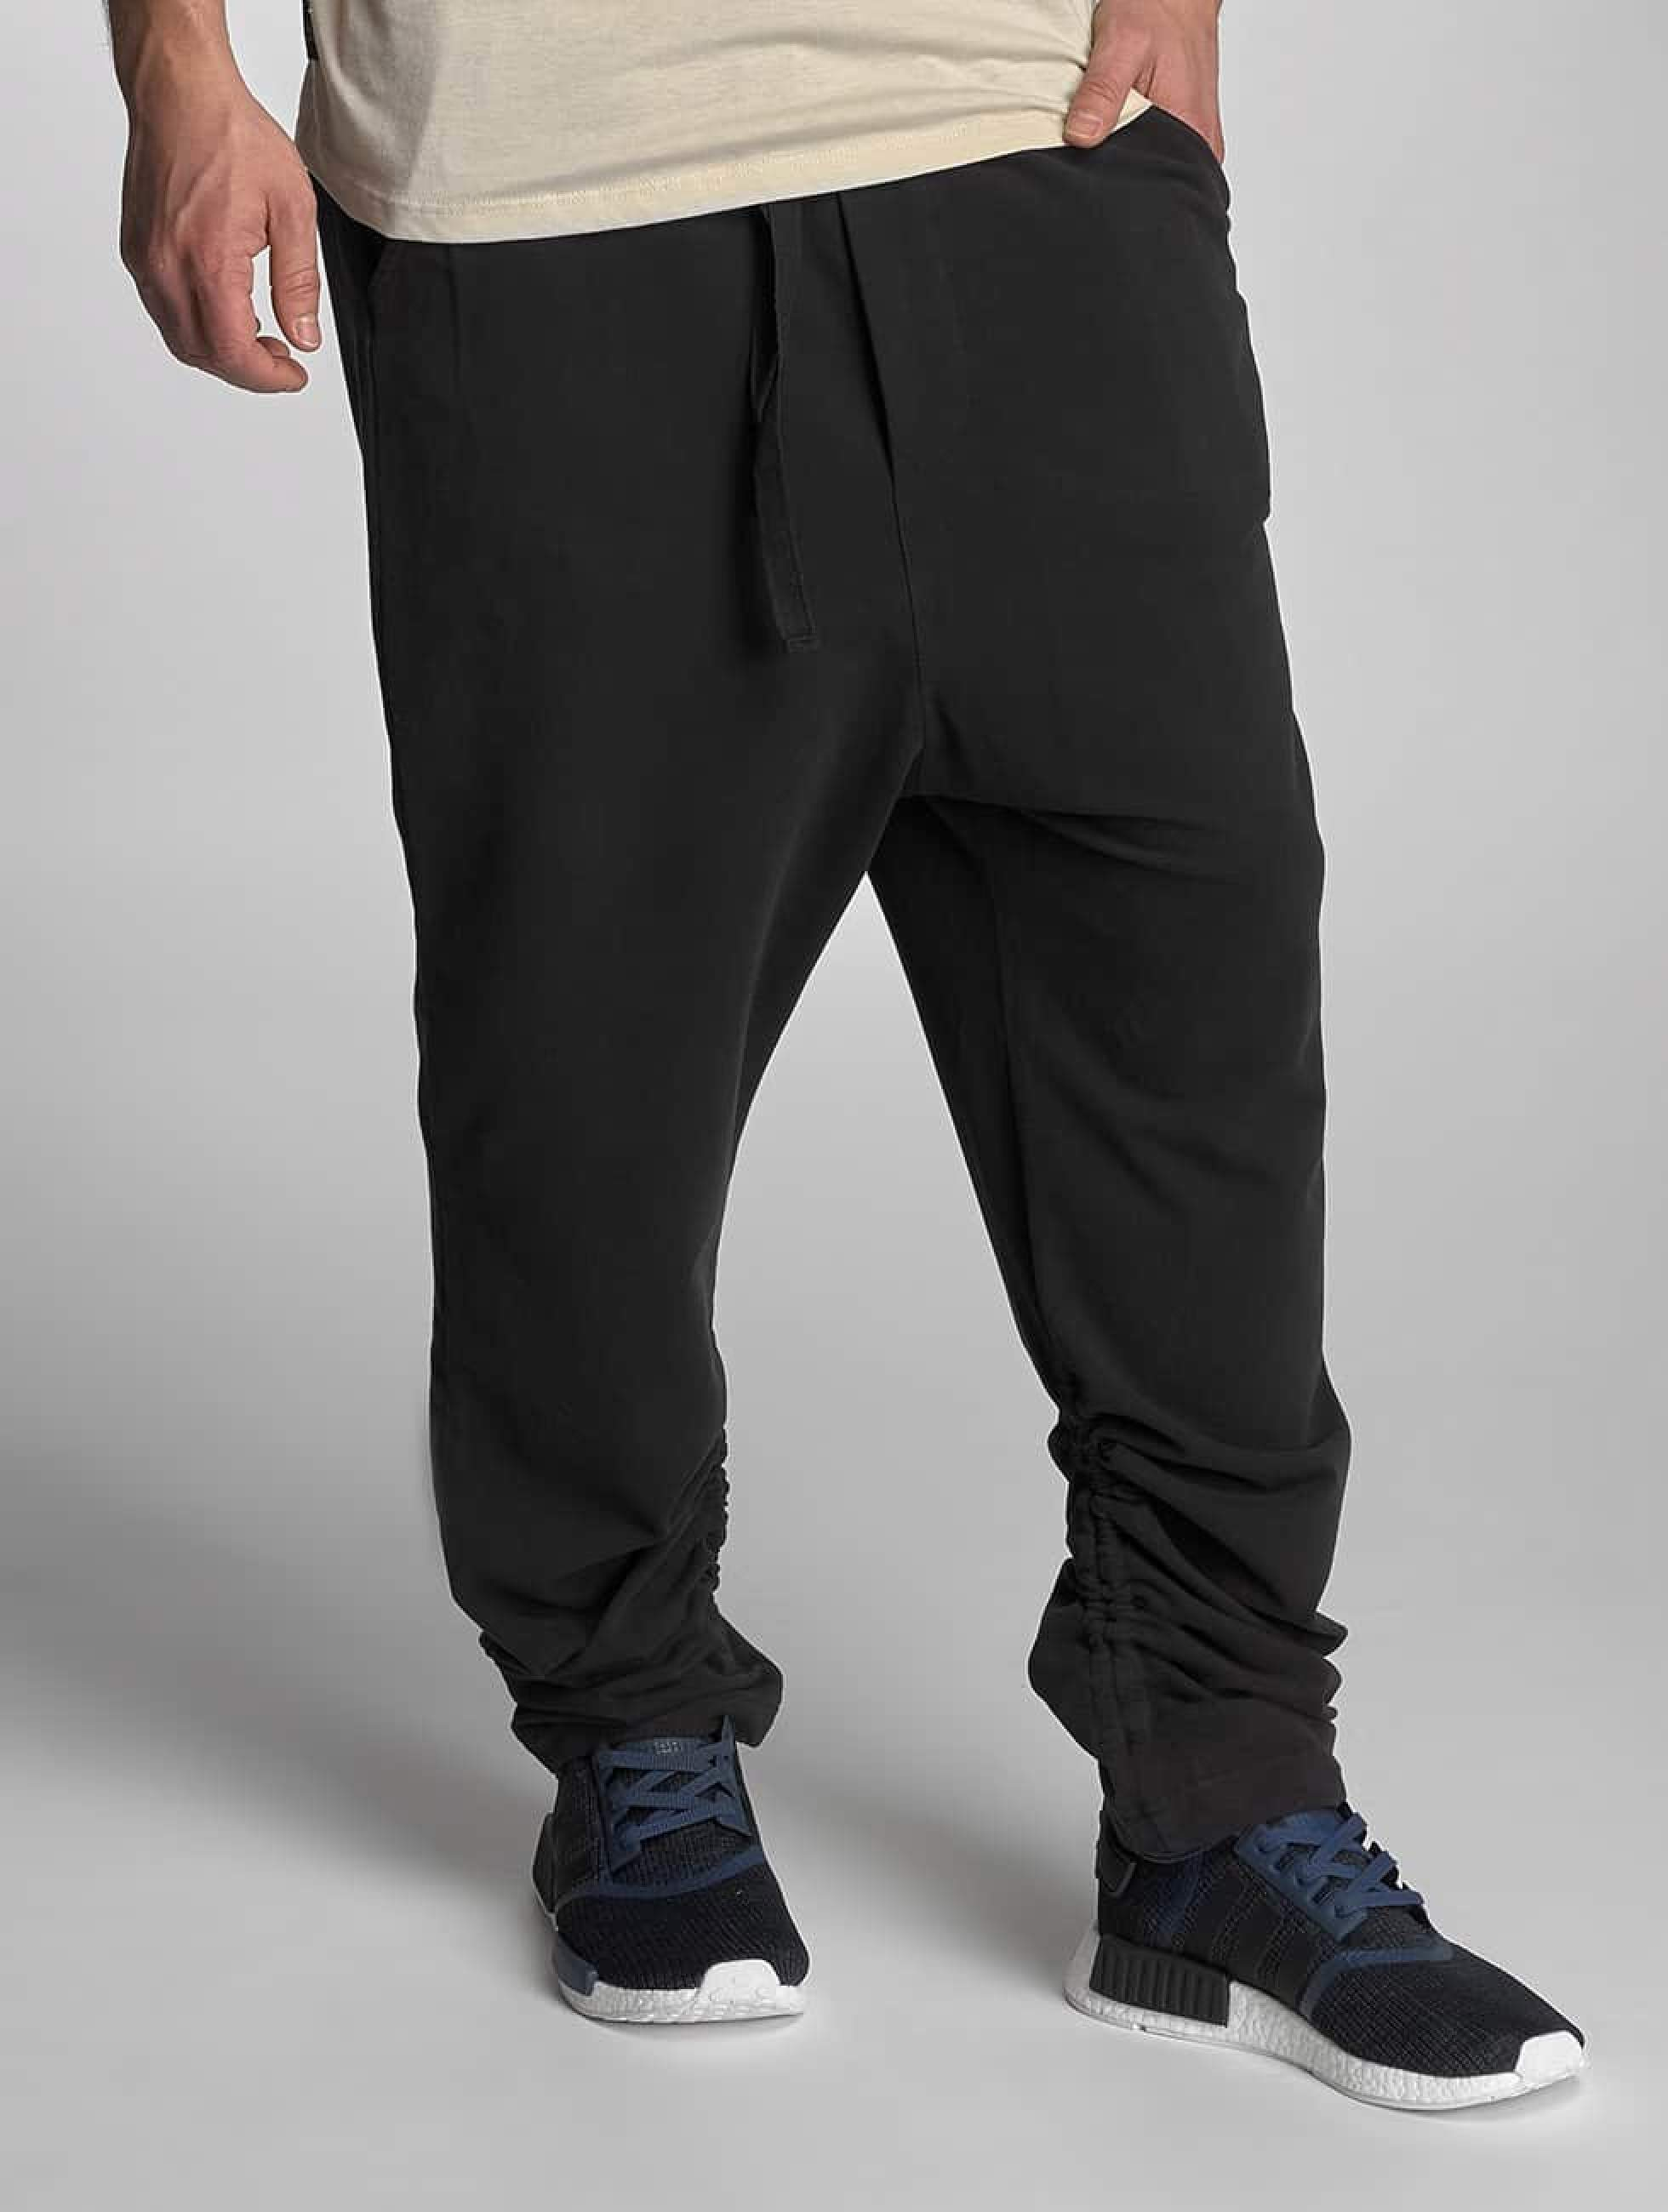 Bangastic / Sweat Pant Segovia in black S